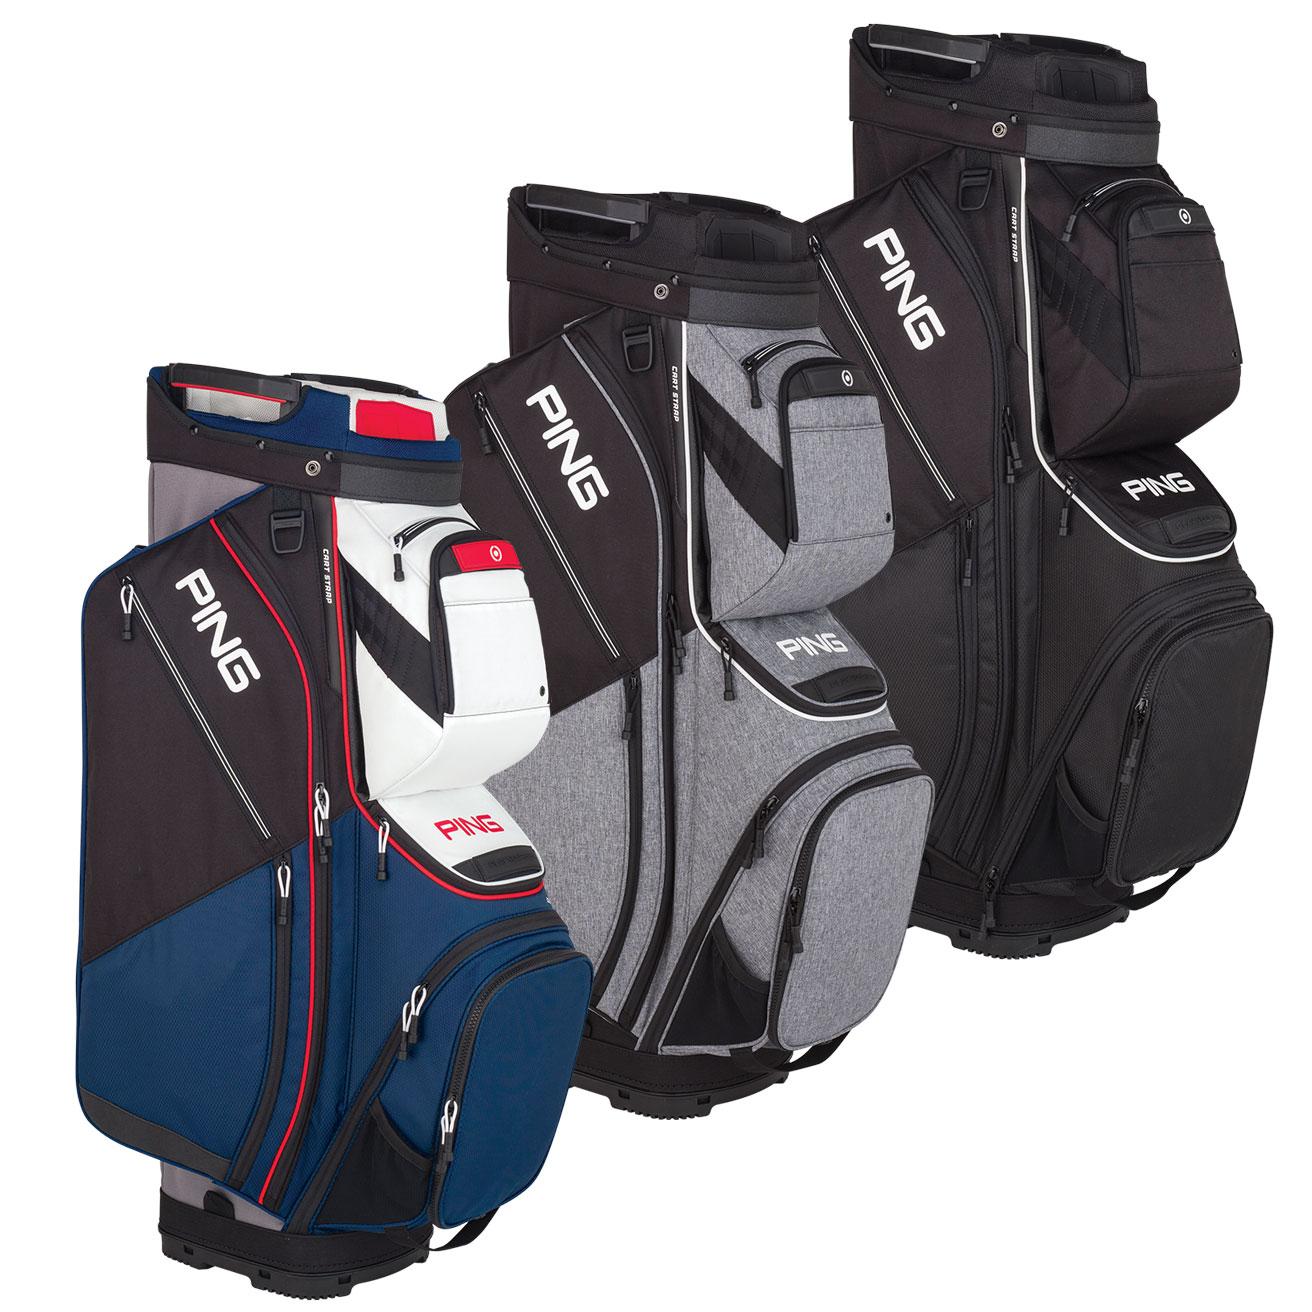 Ping 2019 Pioneer Cart Bag